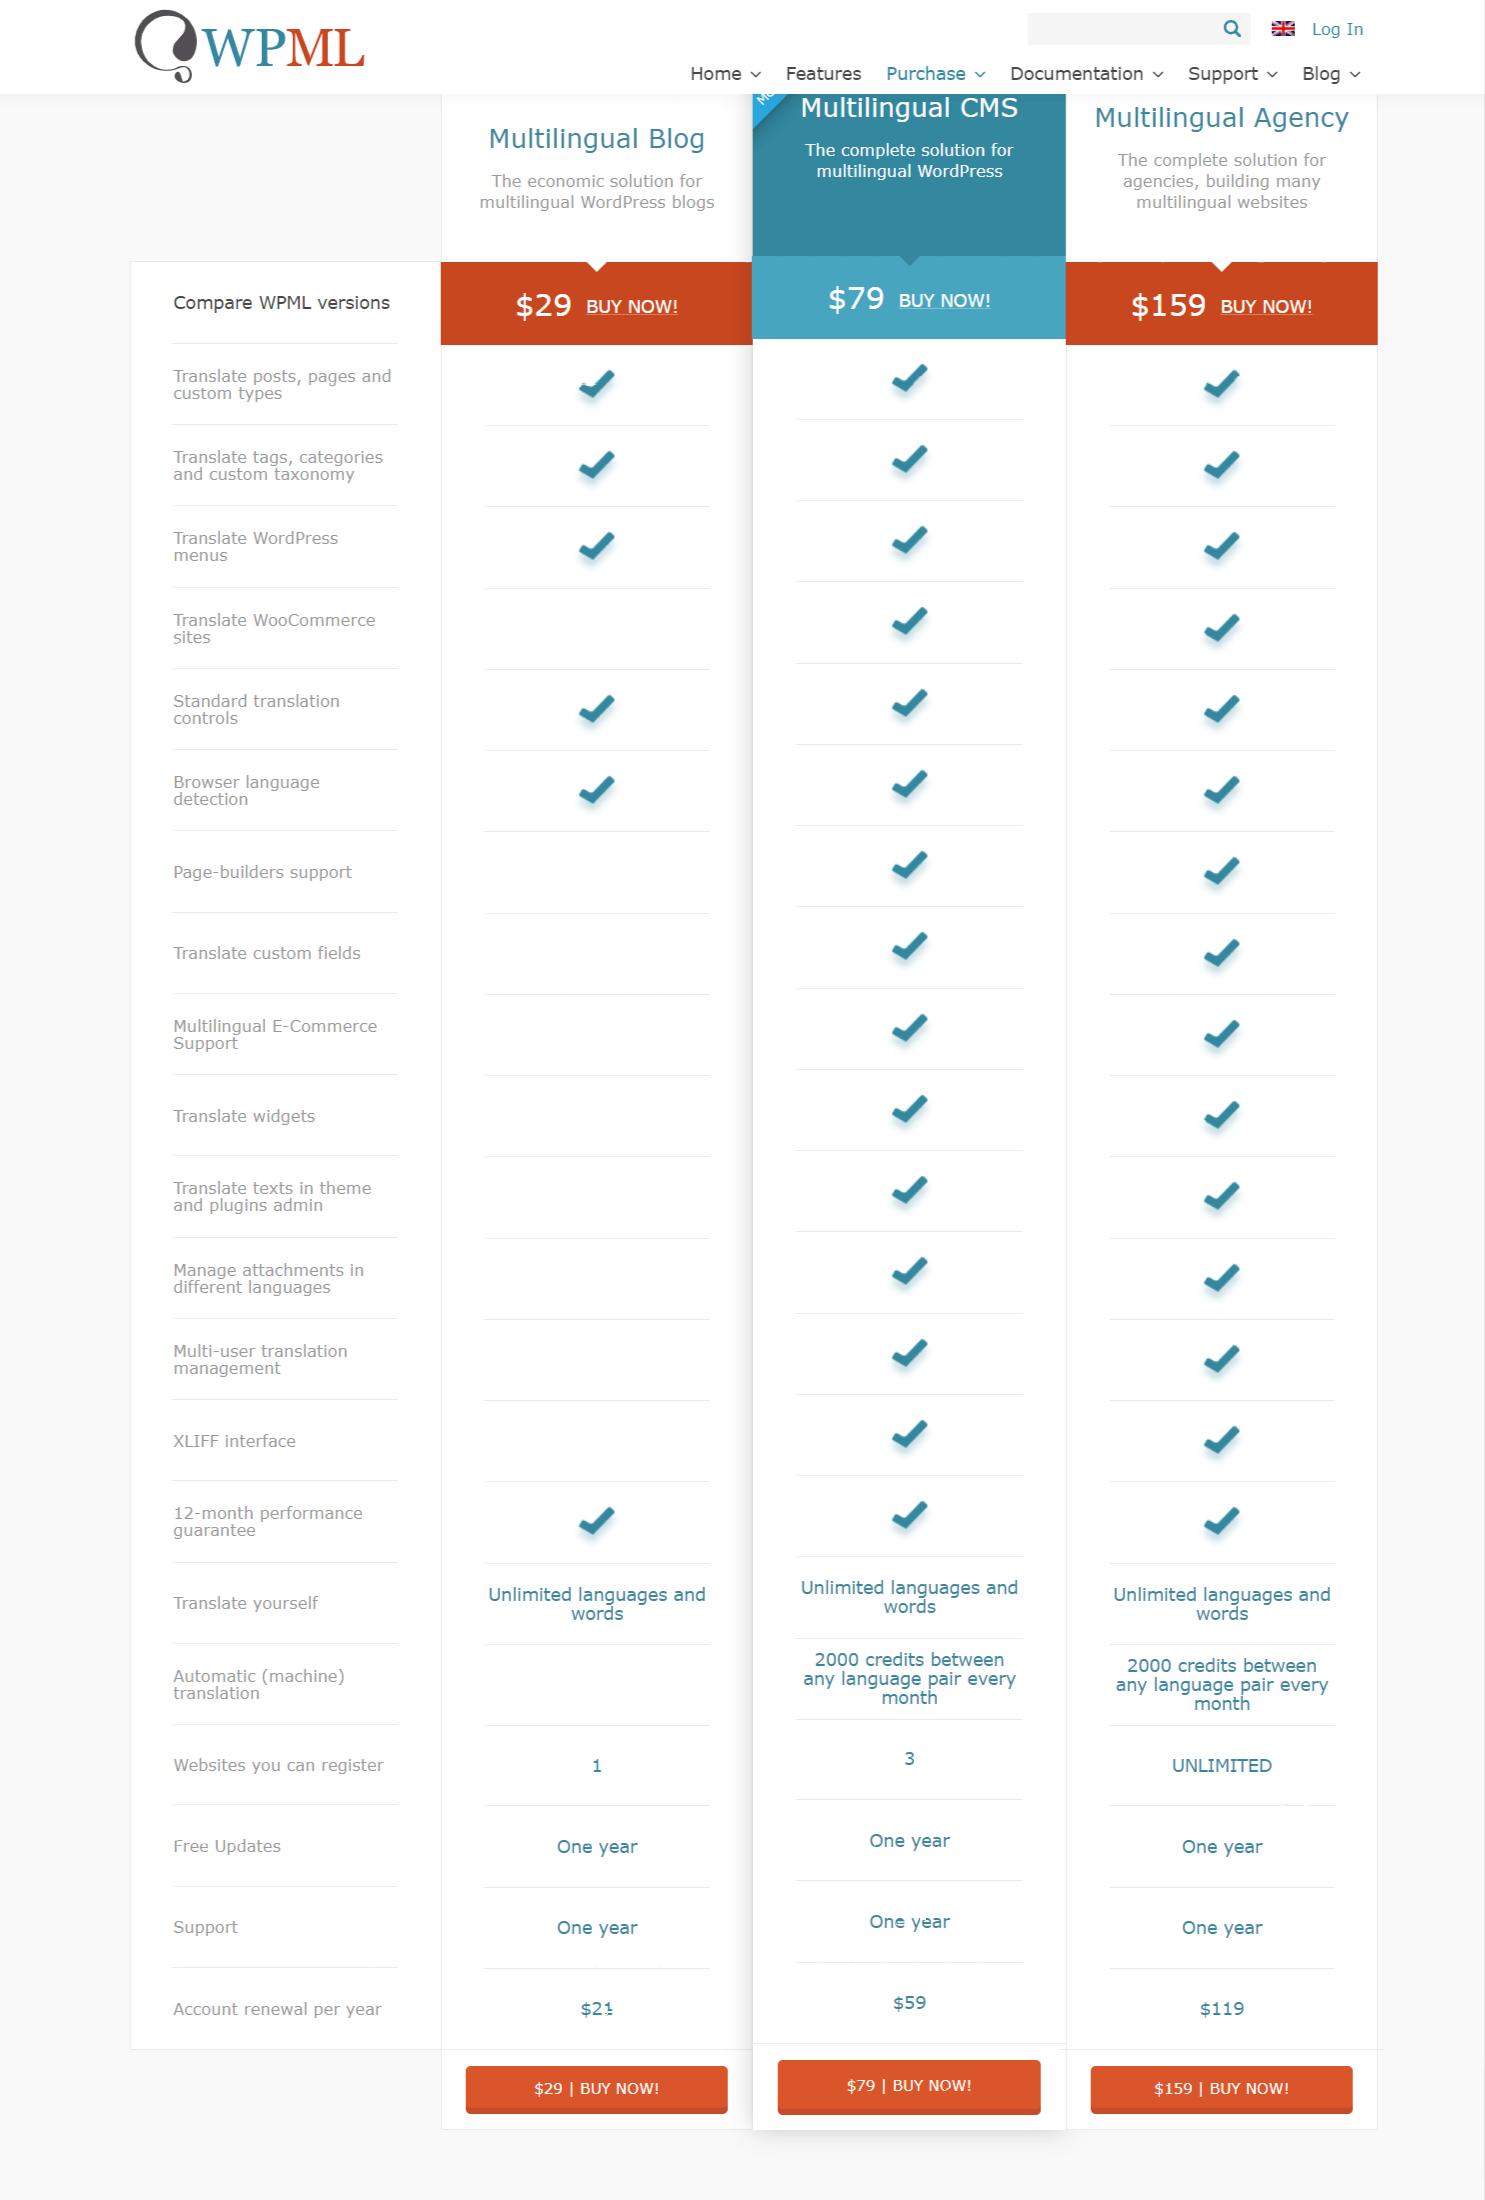 WPML Pricing -Weglot vs WPML